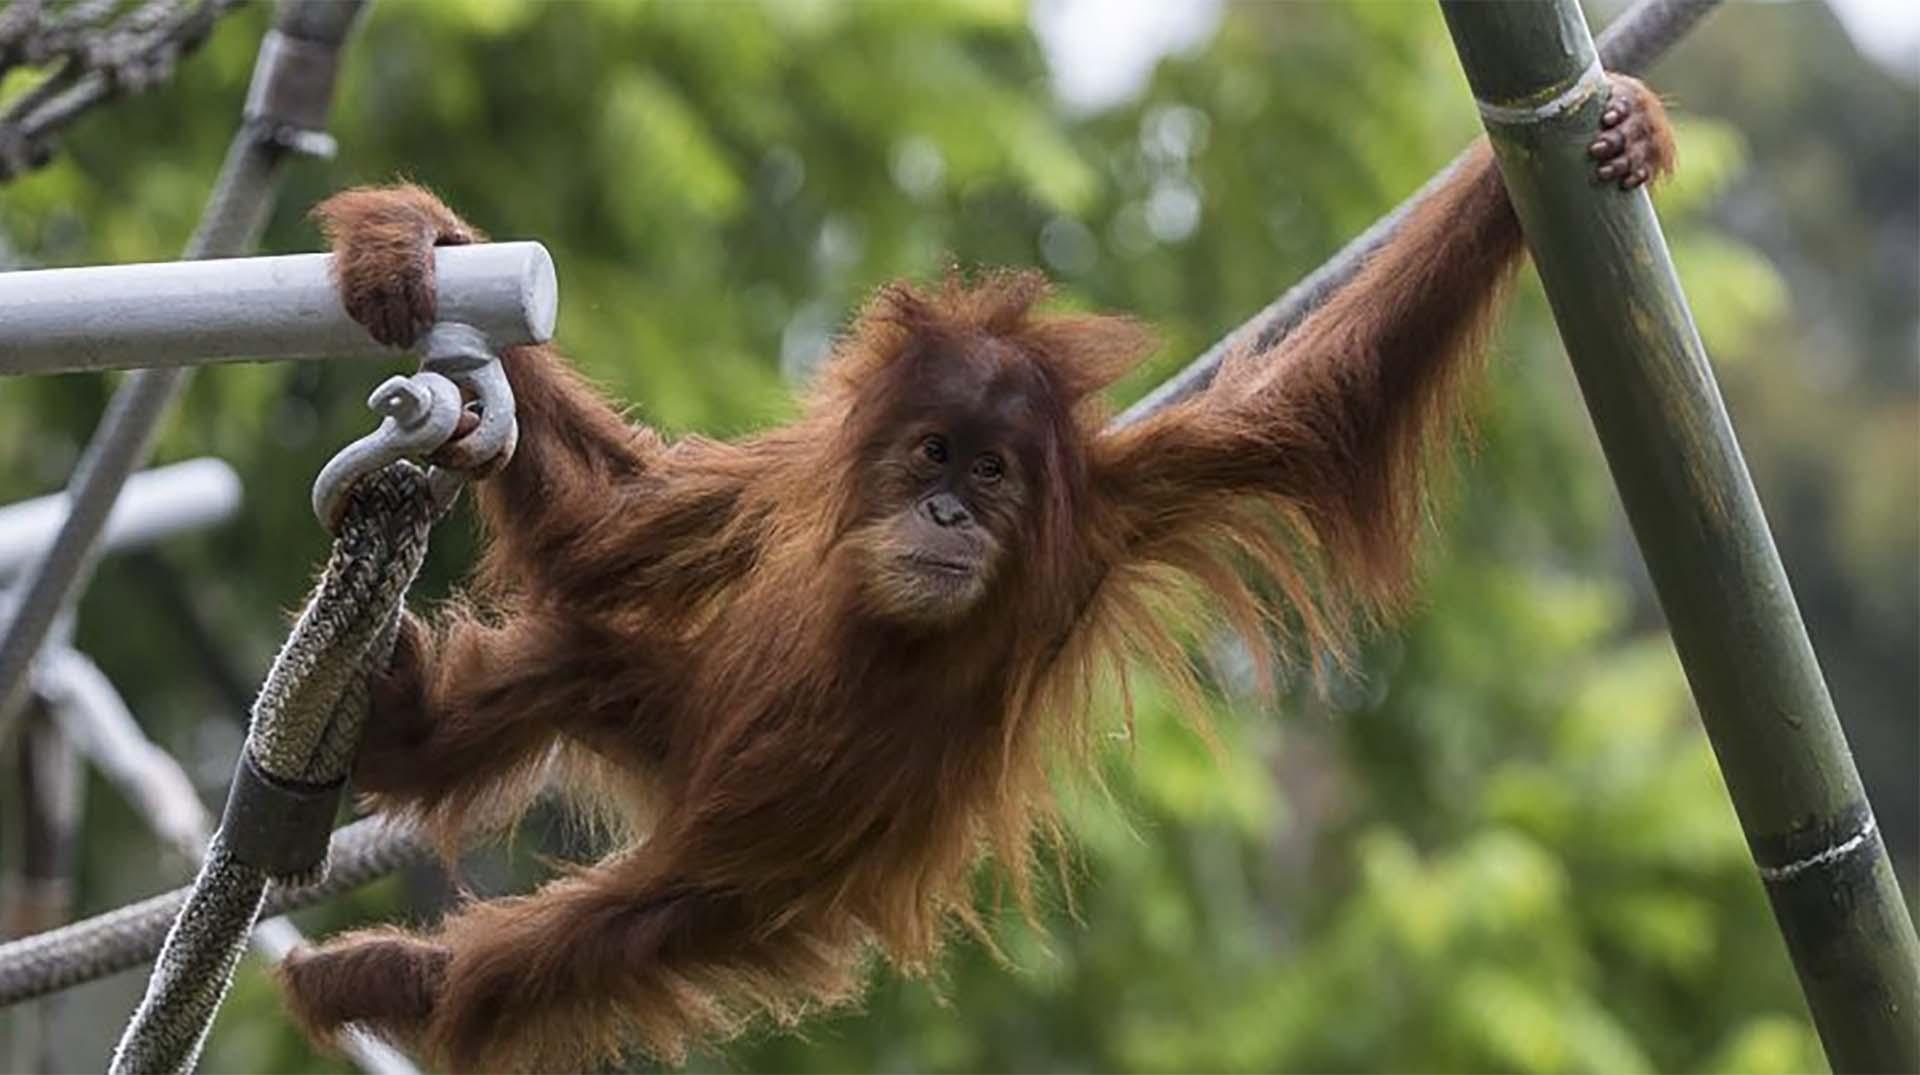 Orangutan in motion.jpg